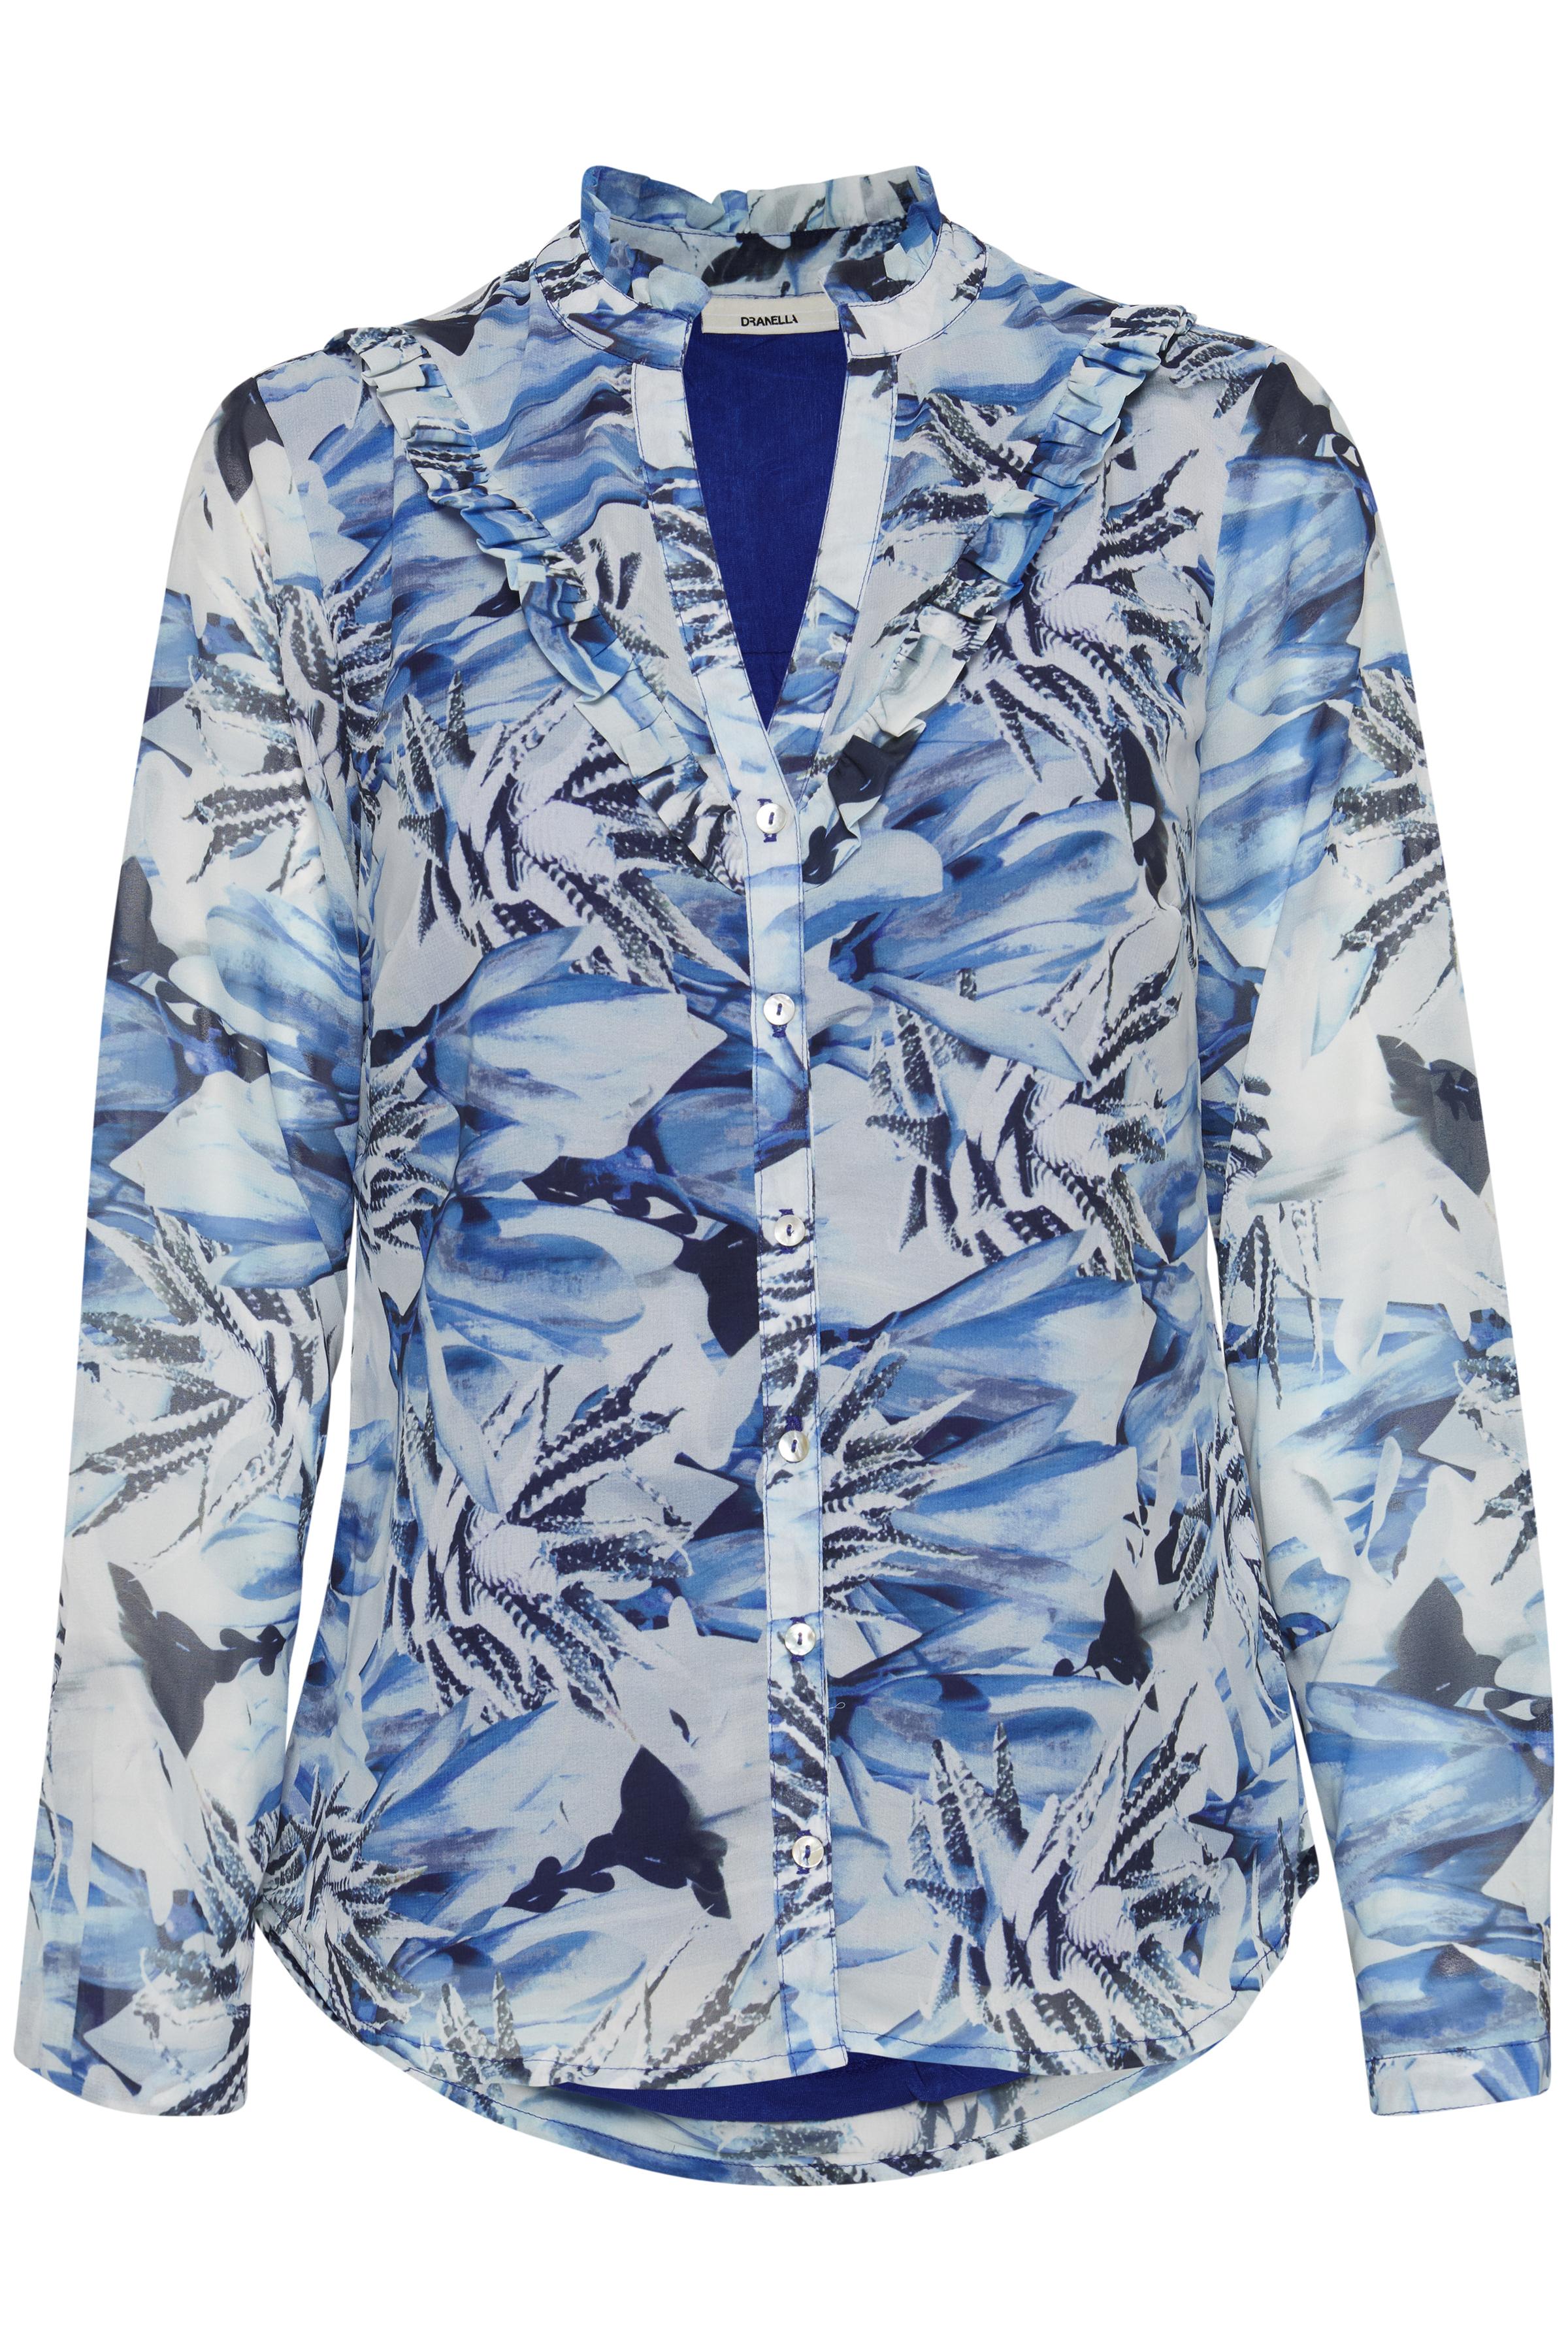 Image of Dranella Dame Dekorativ Mopeya bluse - Blå